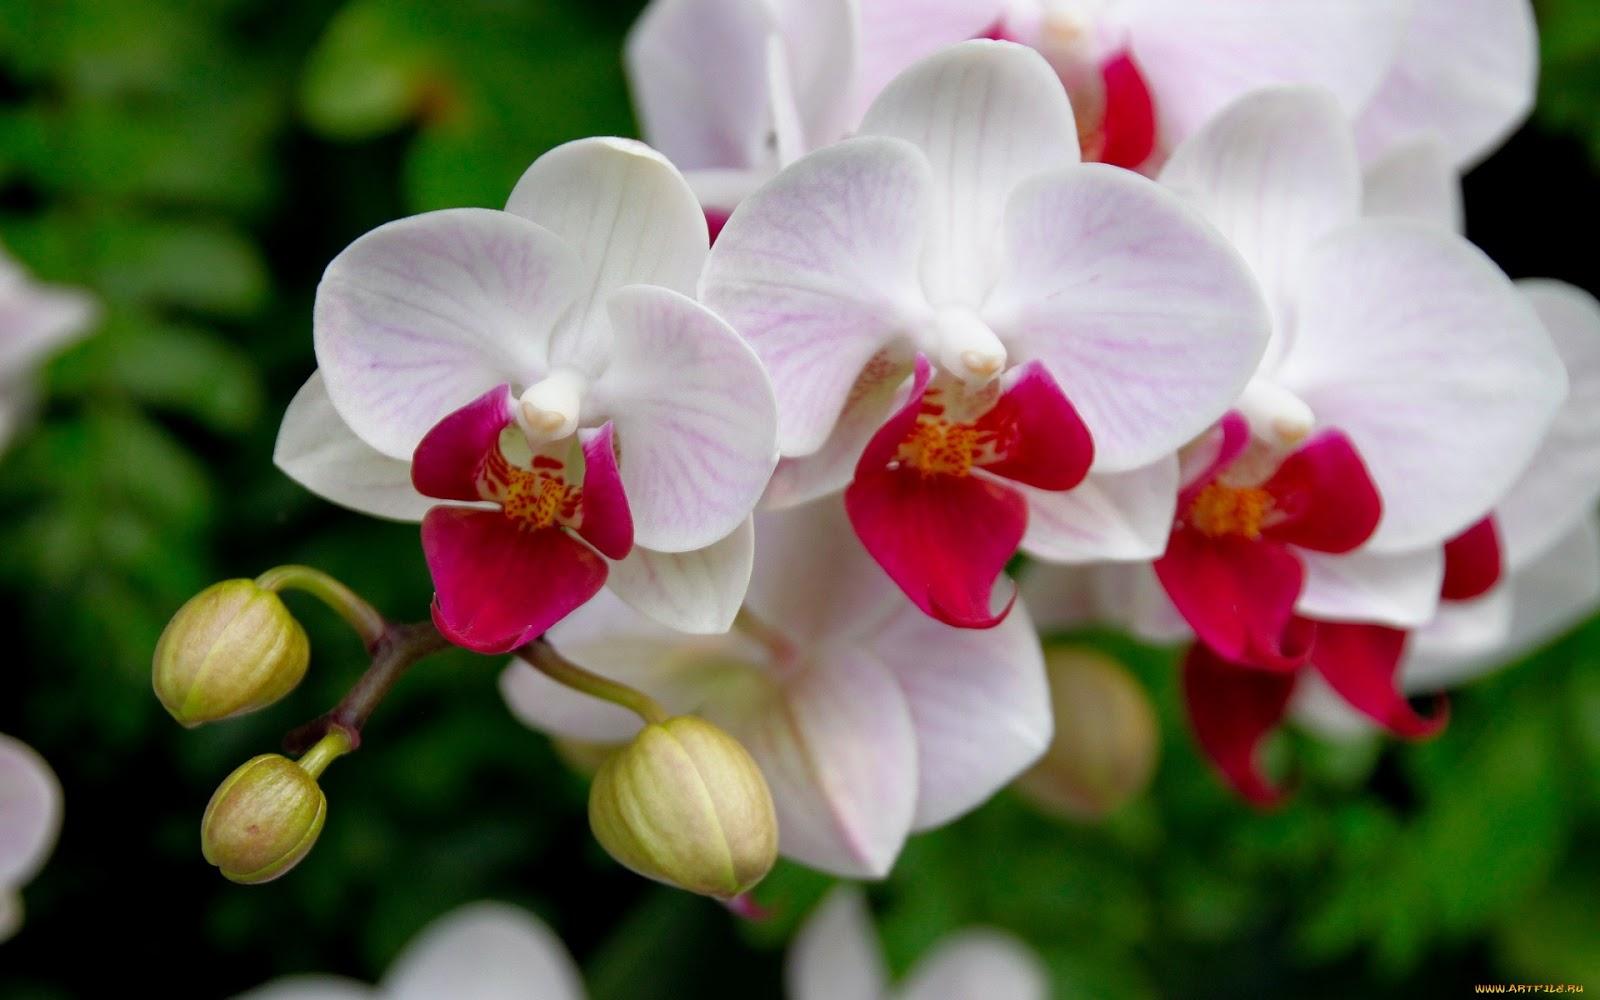 borra de café nas orquídeas: nutrientes.